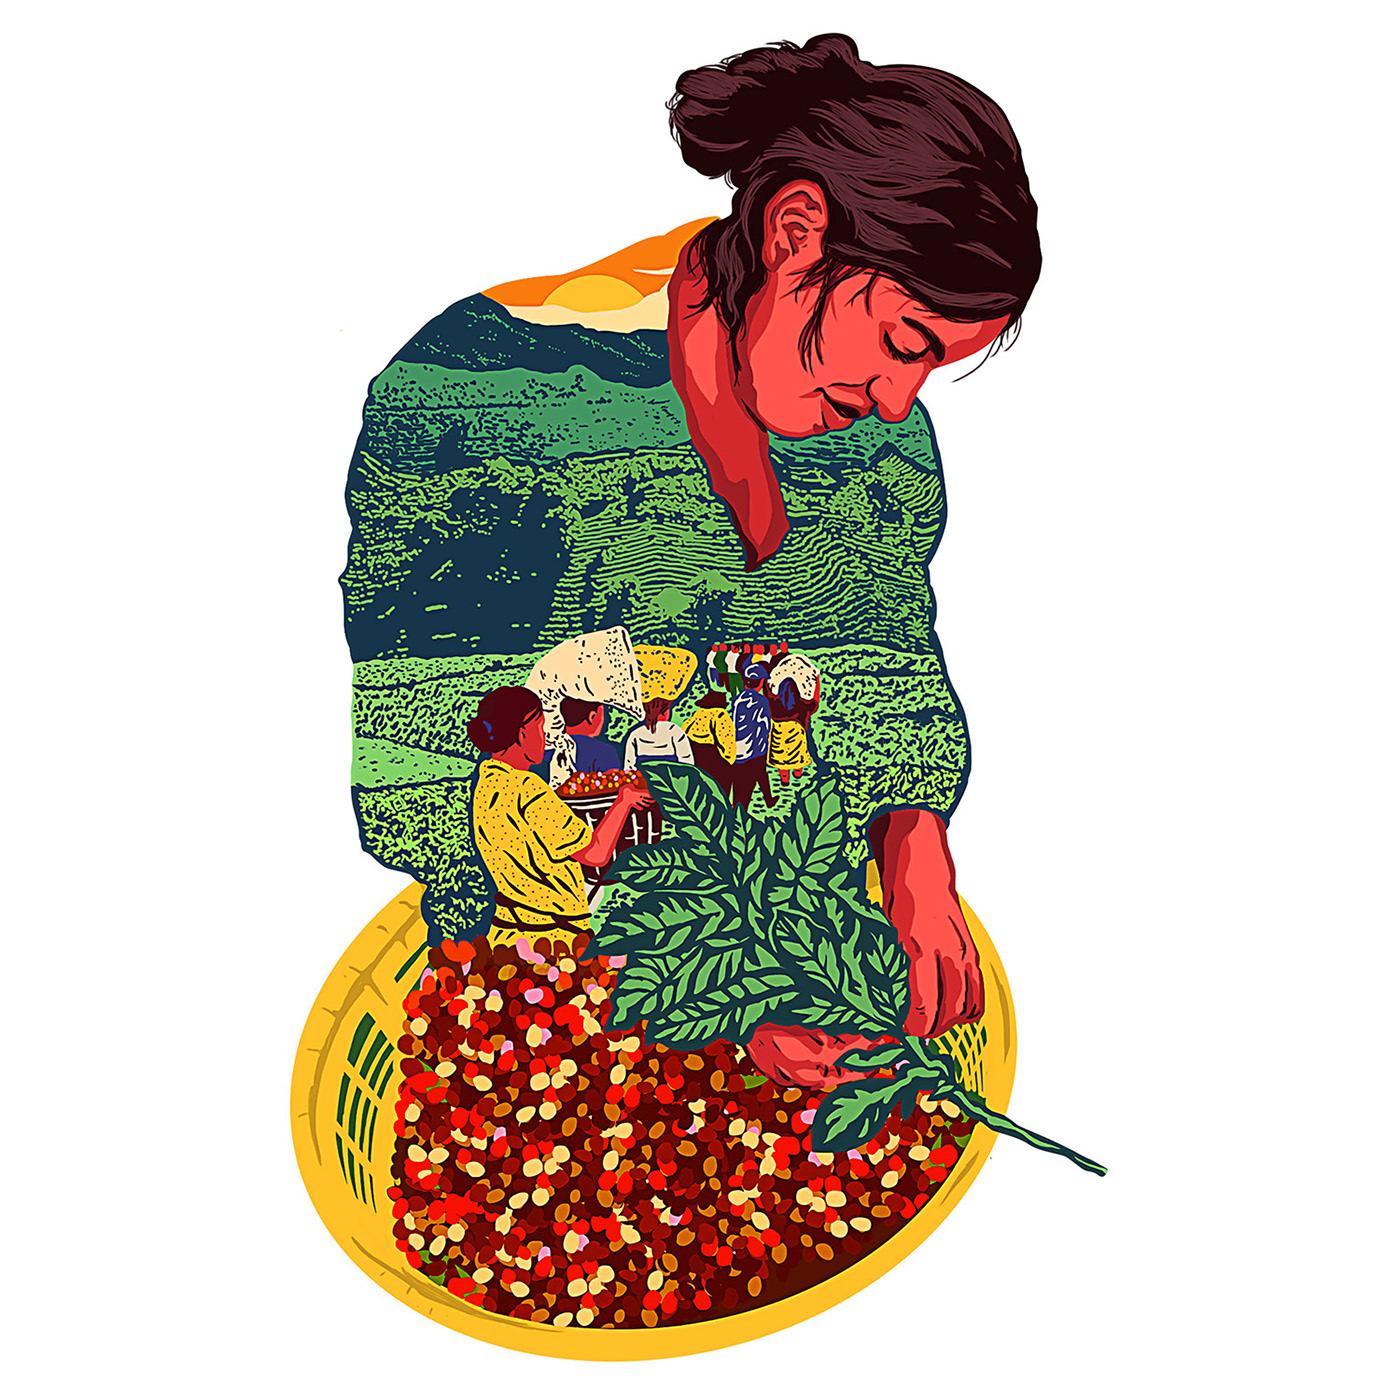 bandola magazine nicaragua coffe migrants centralamerica humanrights migrantes people